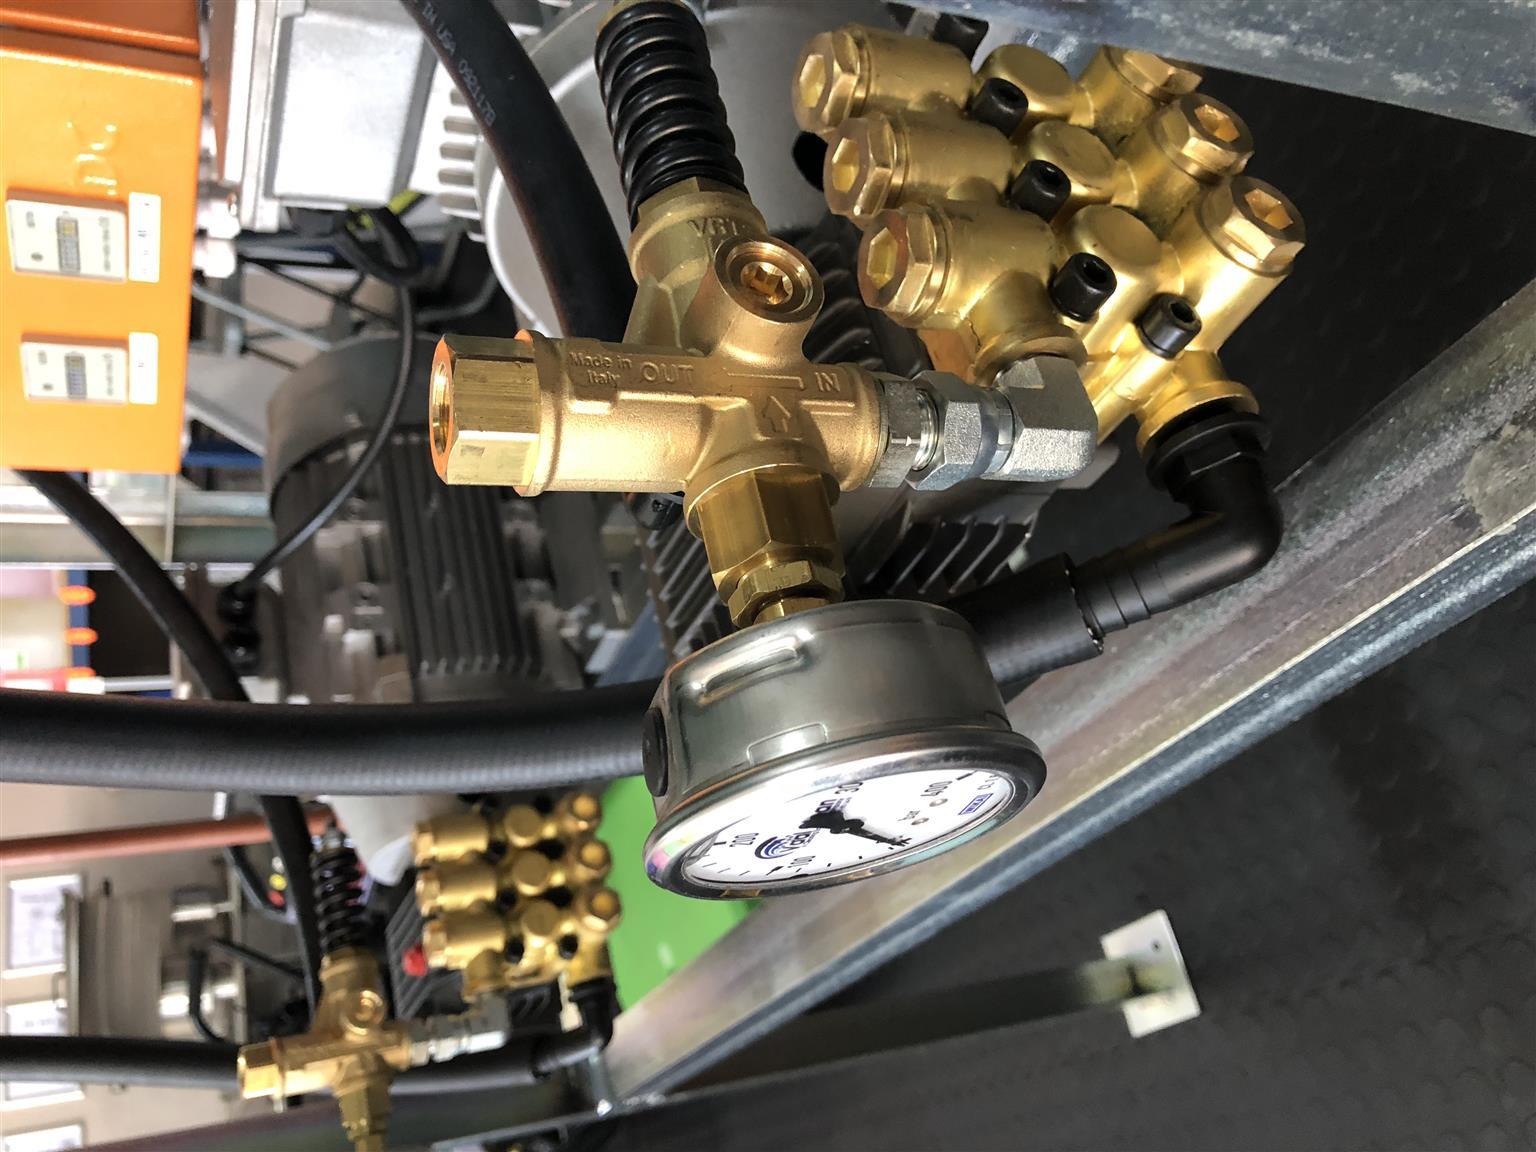 New Professional Car wash pump system